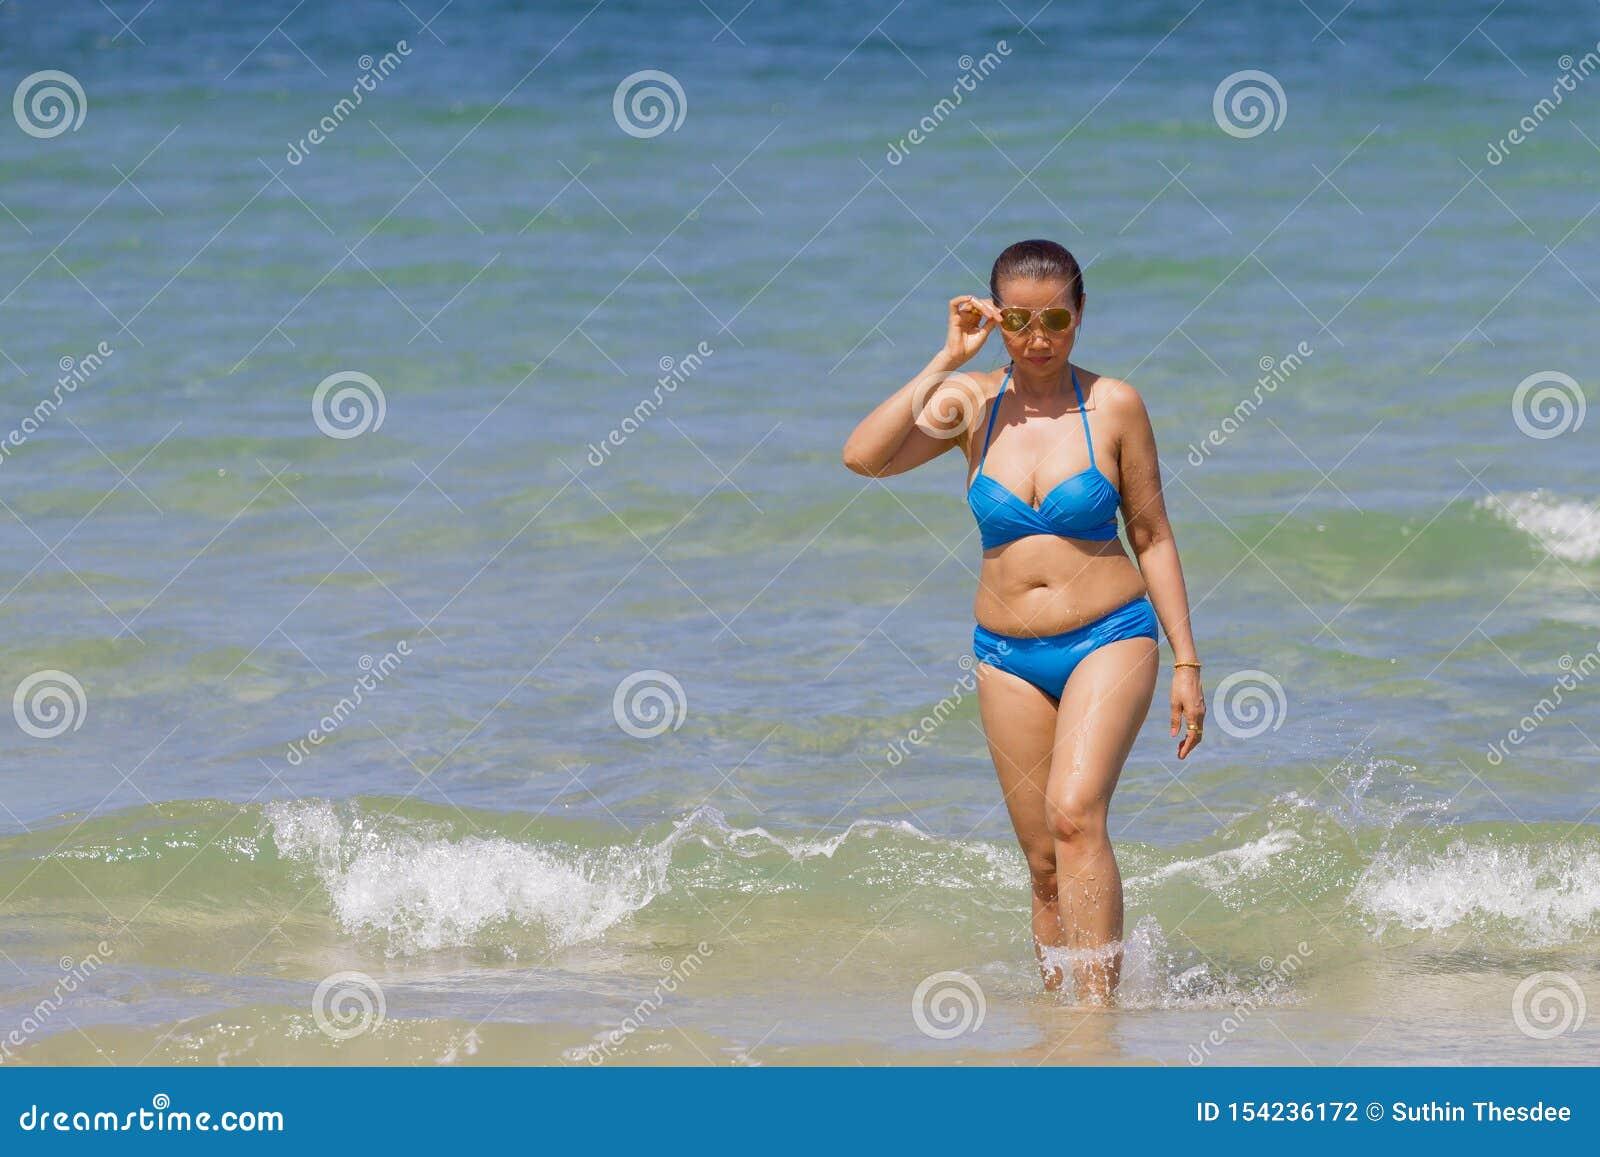 Финал бикини-шоу Hooters International Swimsuit Pageant 2013 | 1155x1600